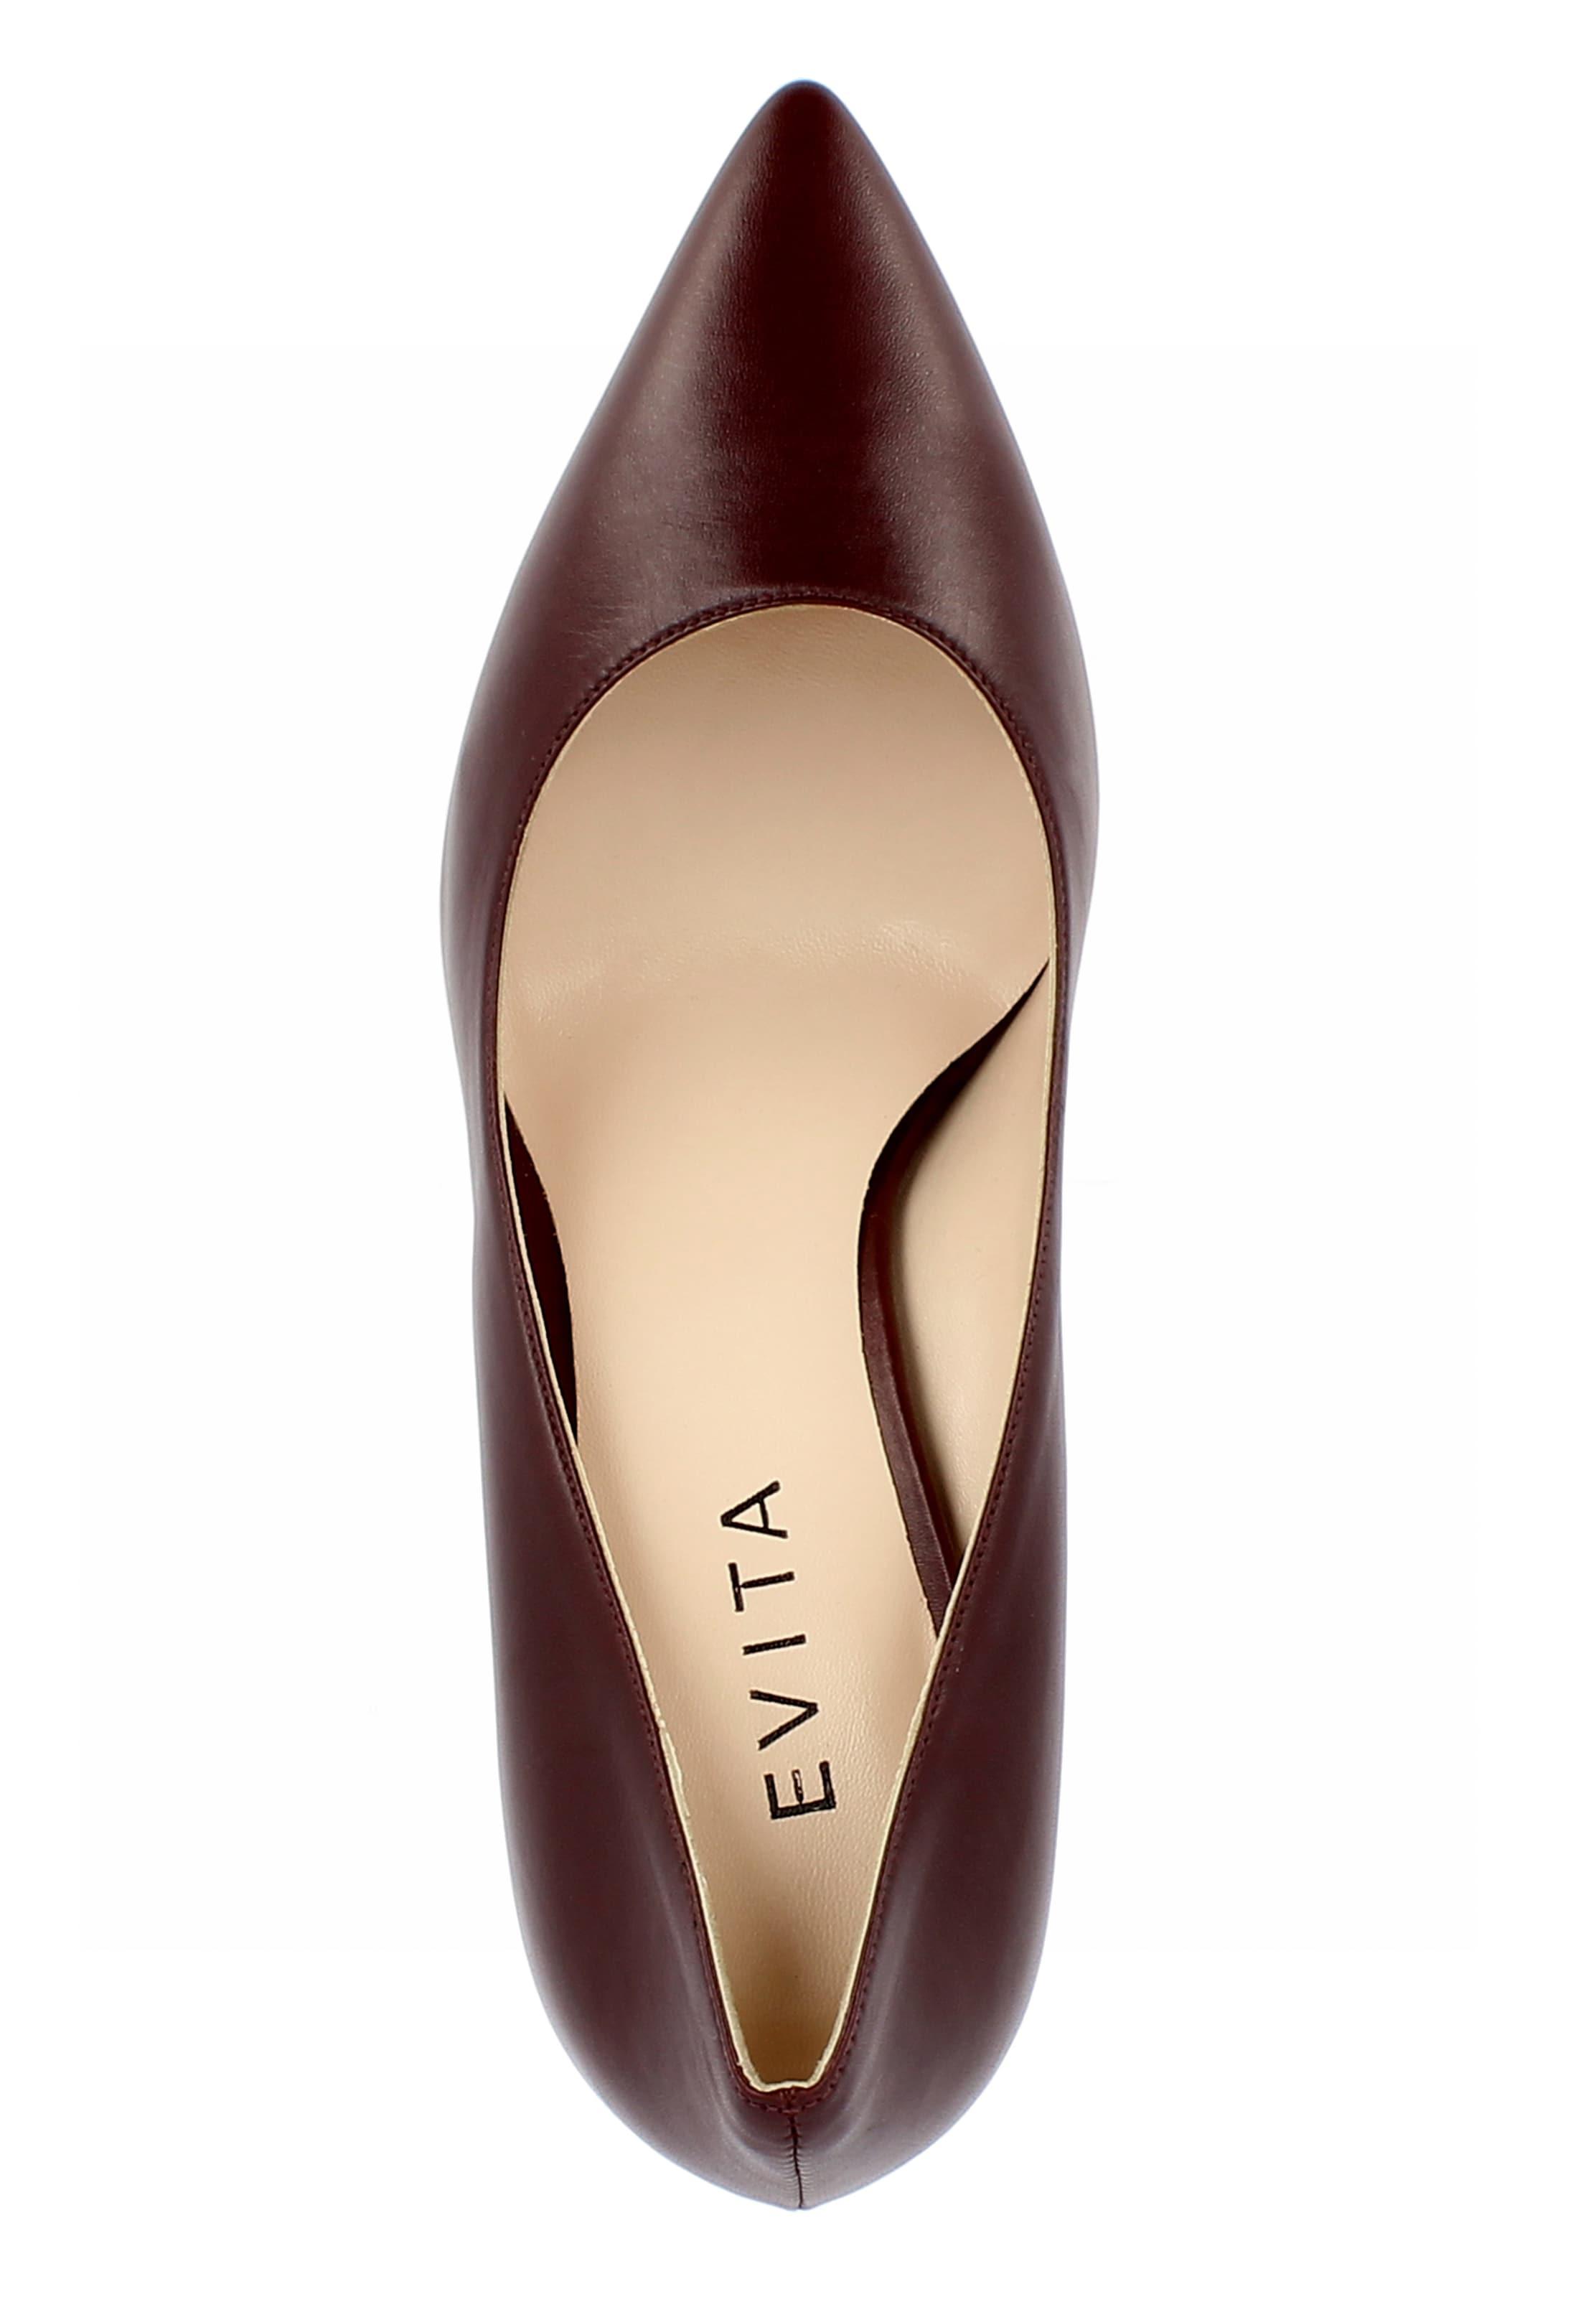 Bordeaux Evita Escarpins 'ilaria' Escarpins 'ilaria' En Evita En Bordeaux EDeW29HIY